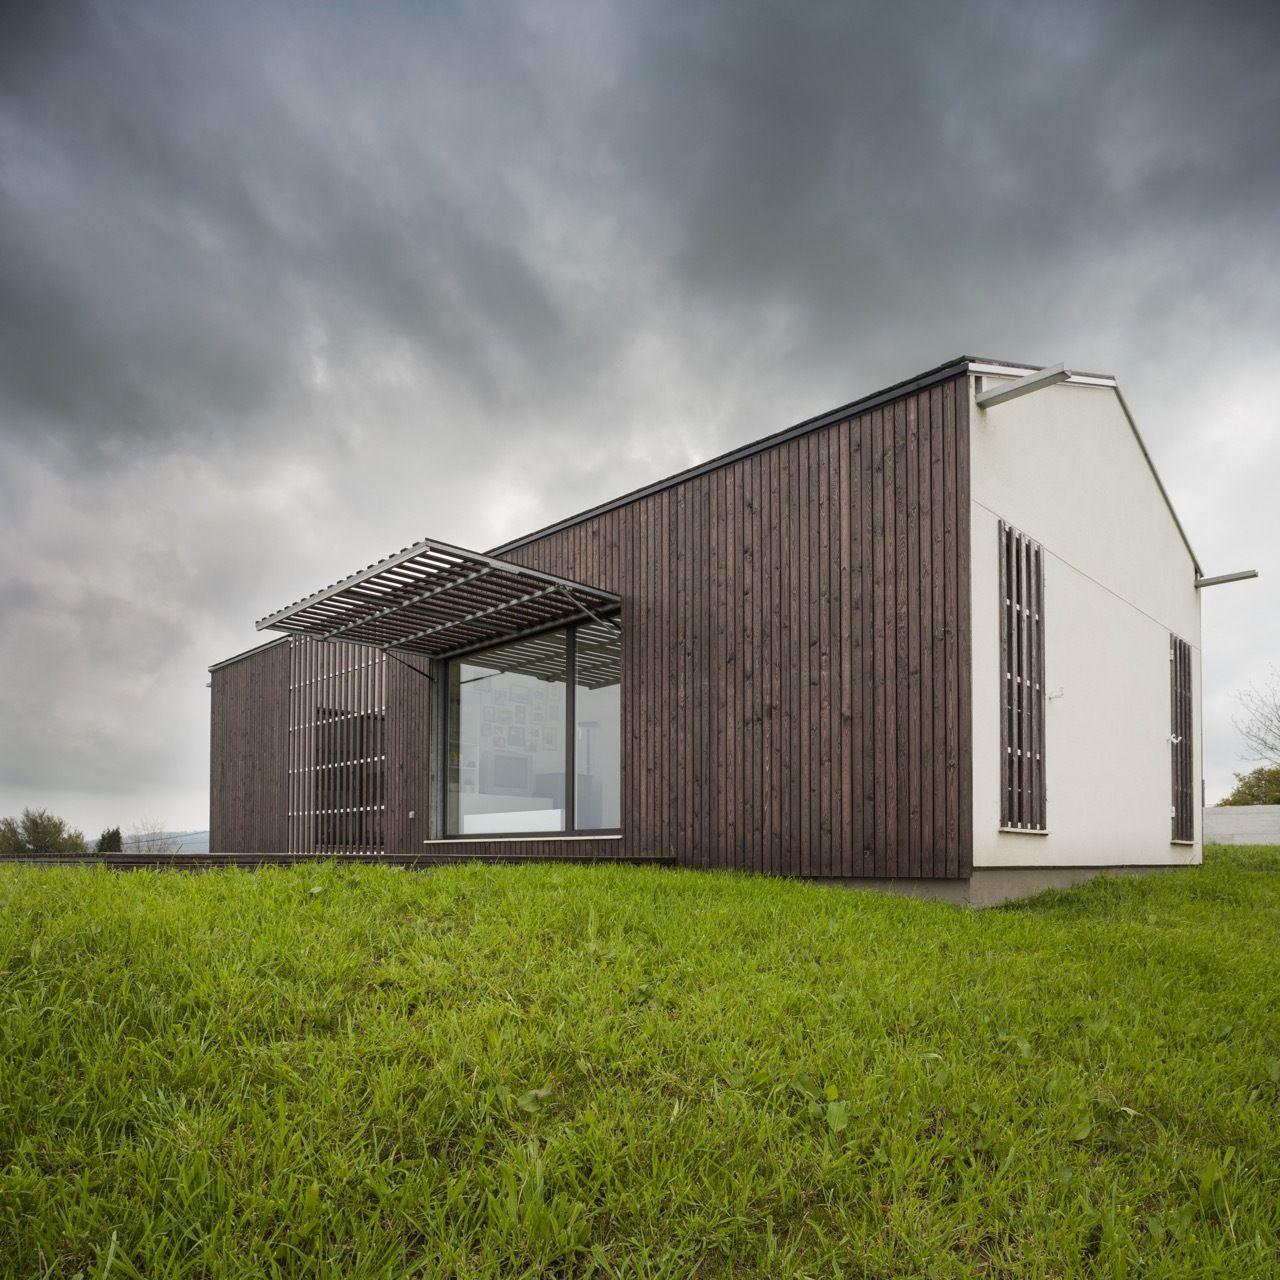 Galeria - Casa JG / Modulo 12 Architects - 11